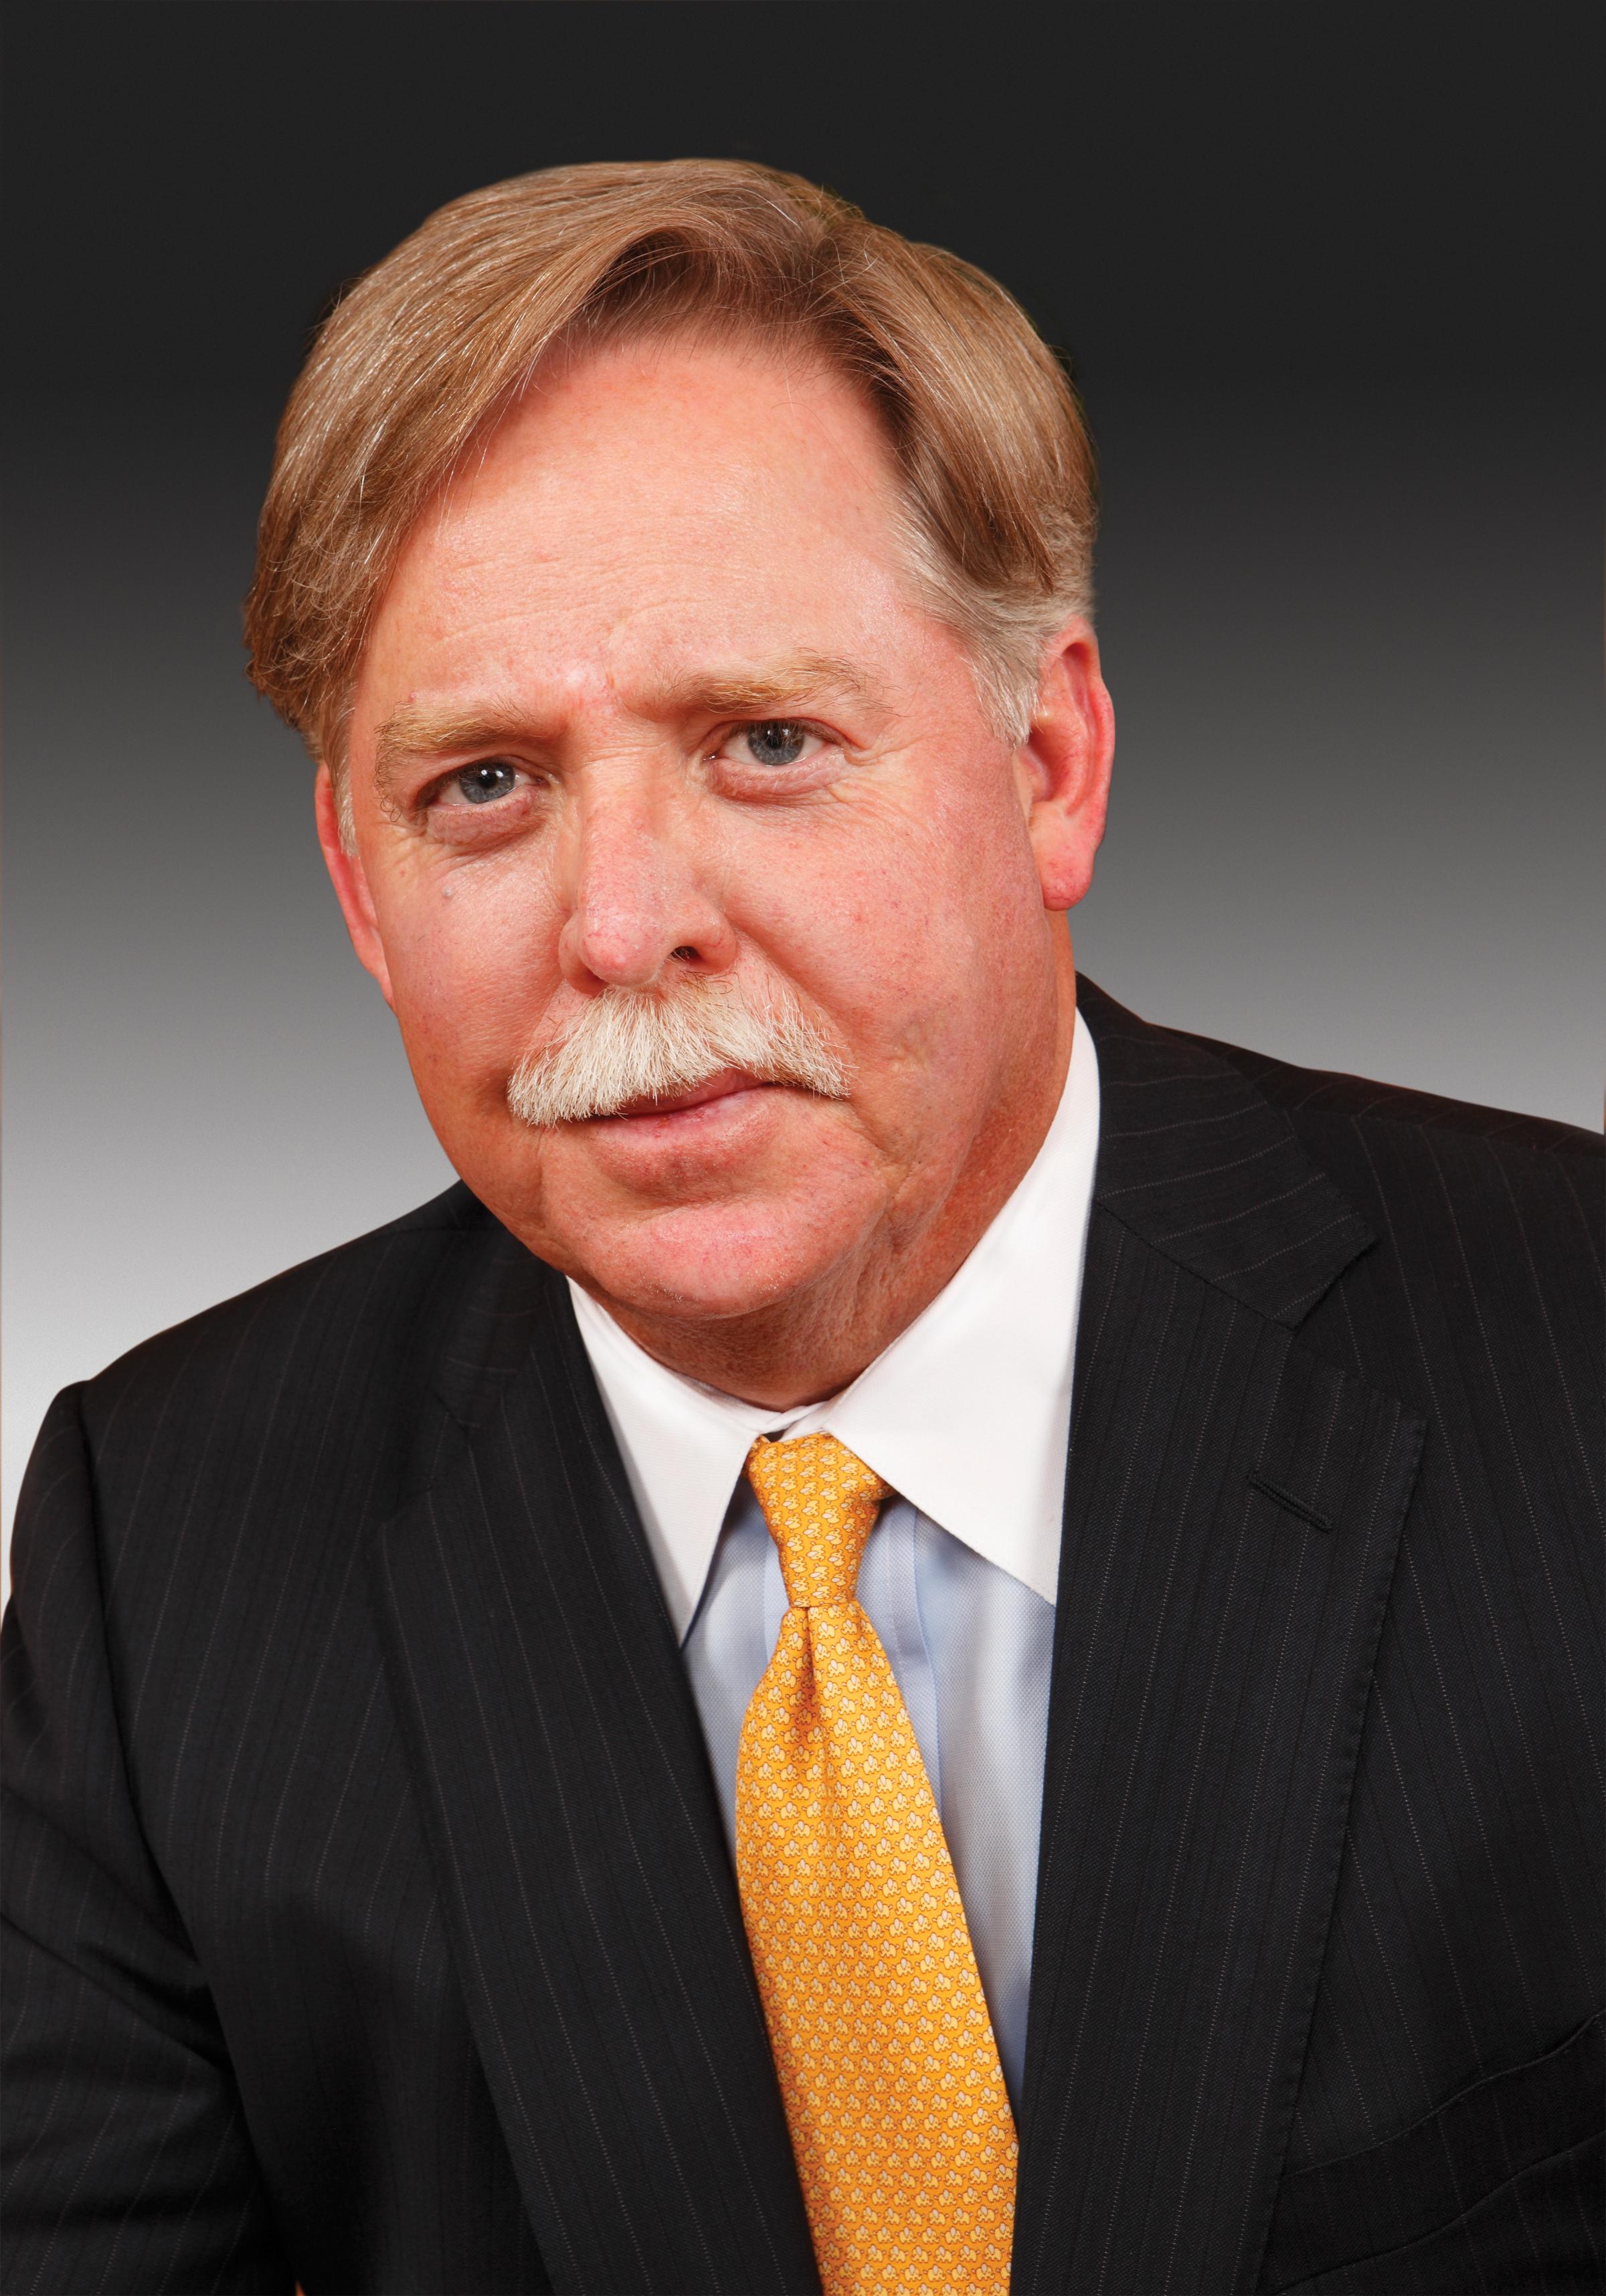 Mike McAllister